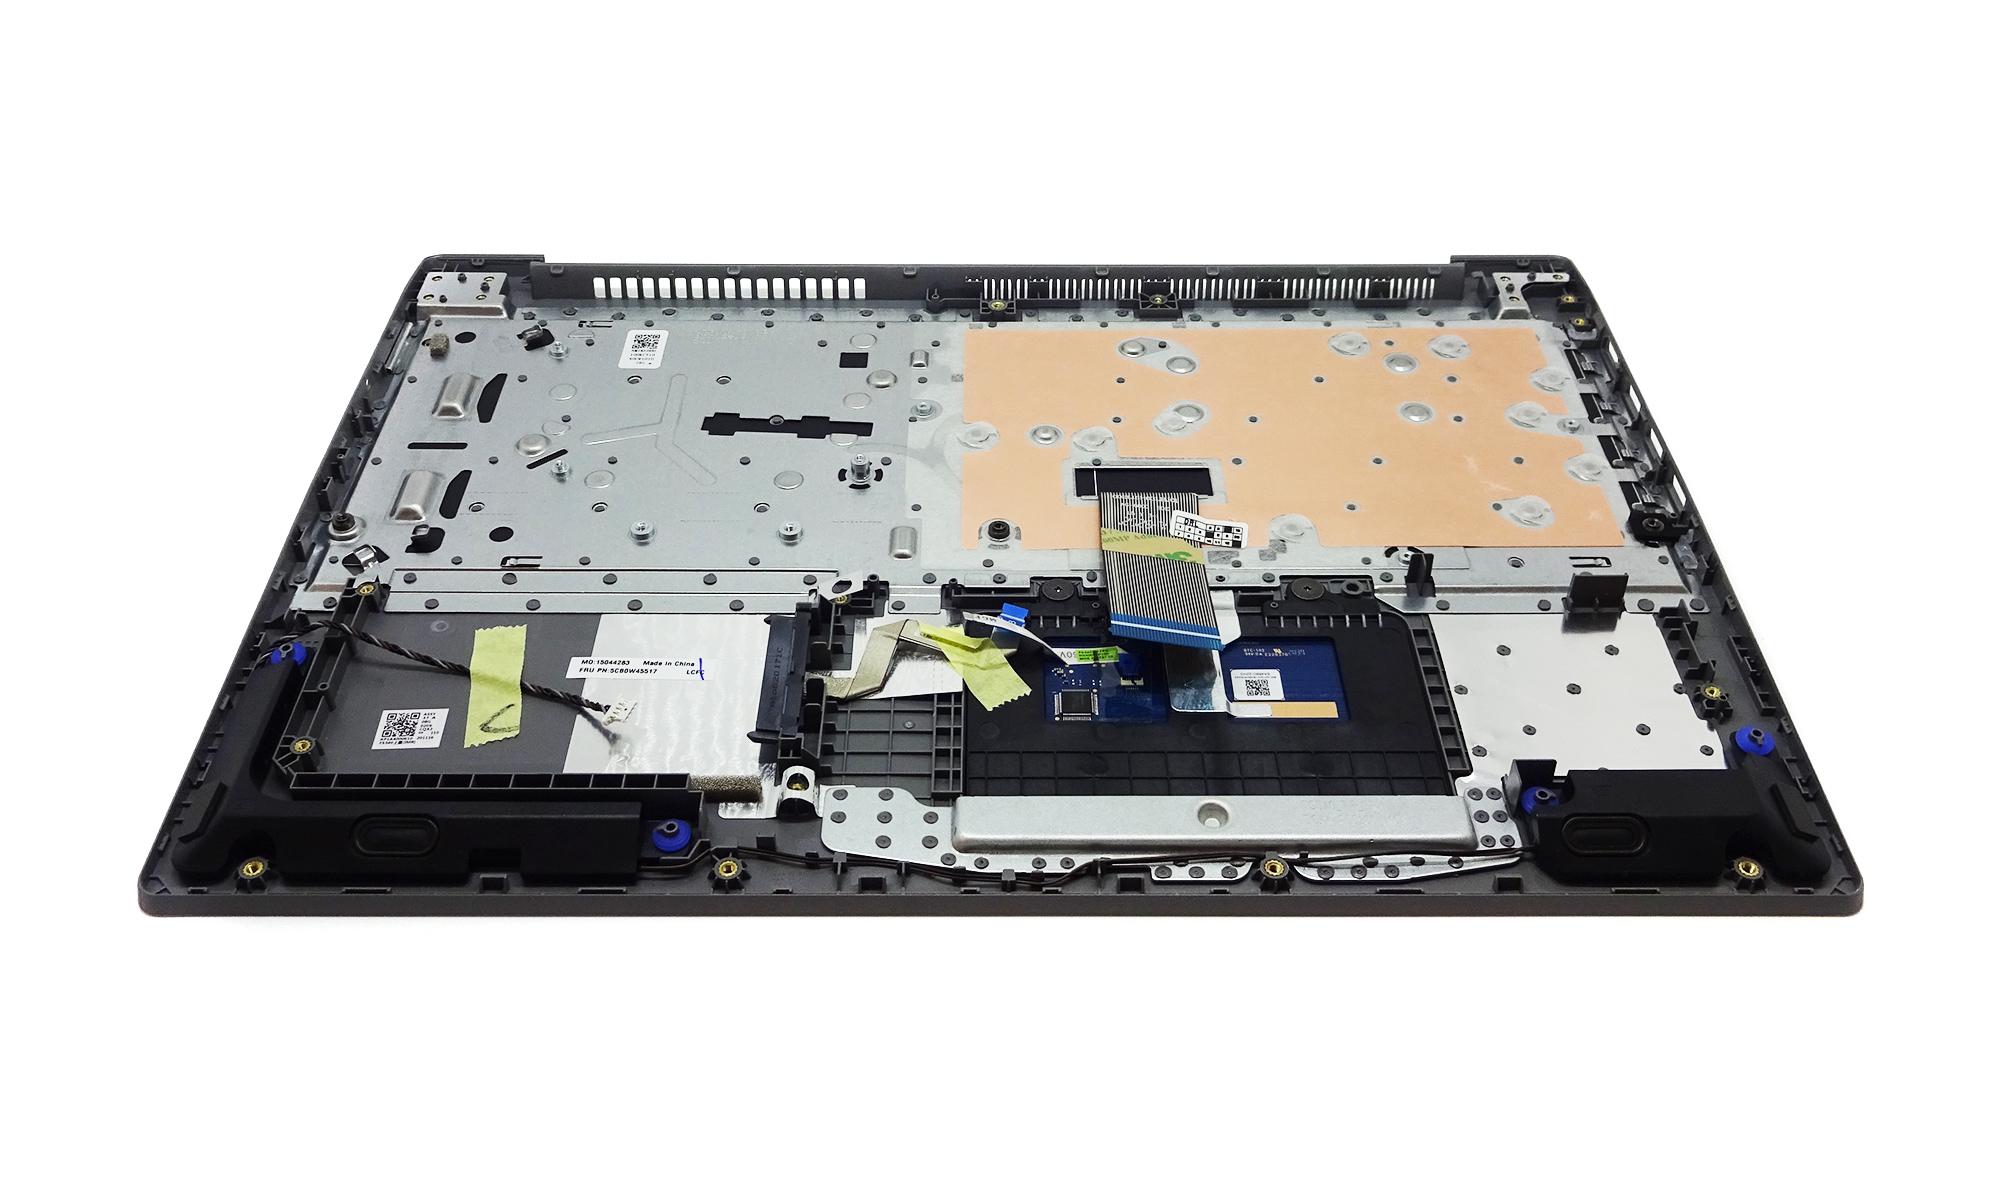 Carcasa superioara cu tastatura Lenovo IdeaPad S145-15IIL Type 81W8, argintie, layout US, fara iluminare, originala, model 5CB0W45517